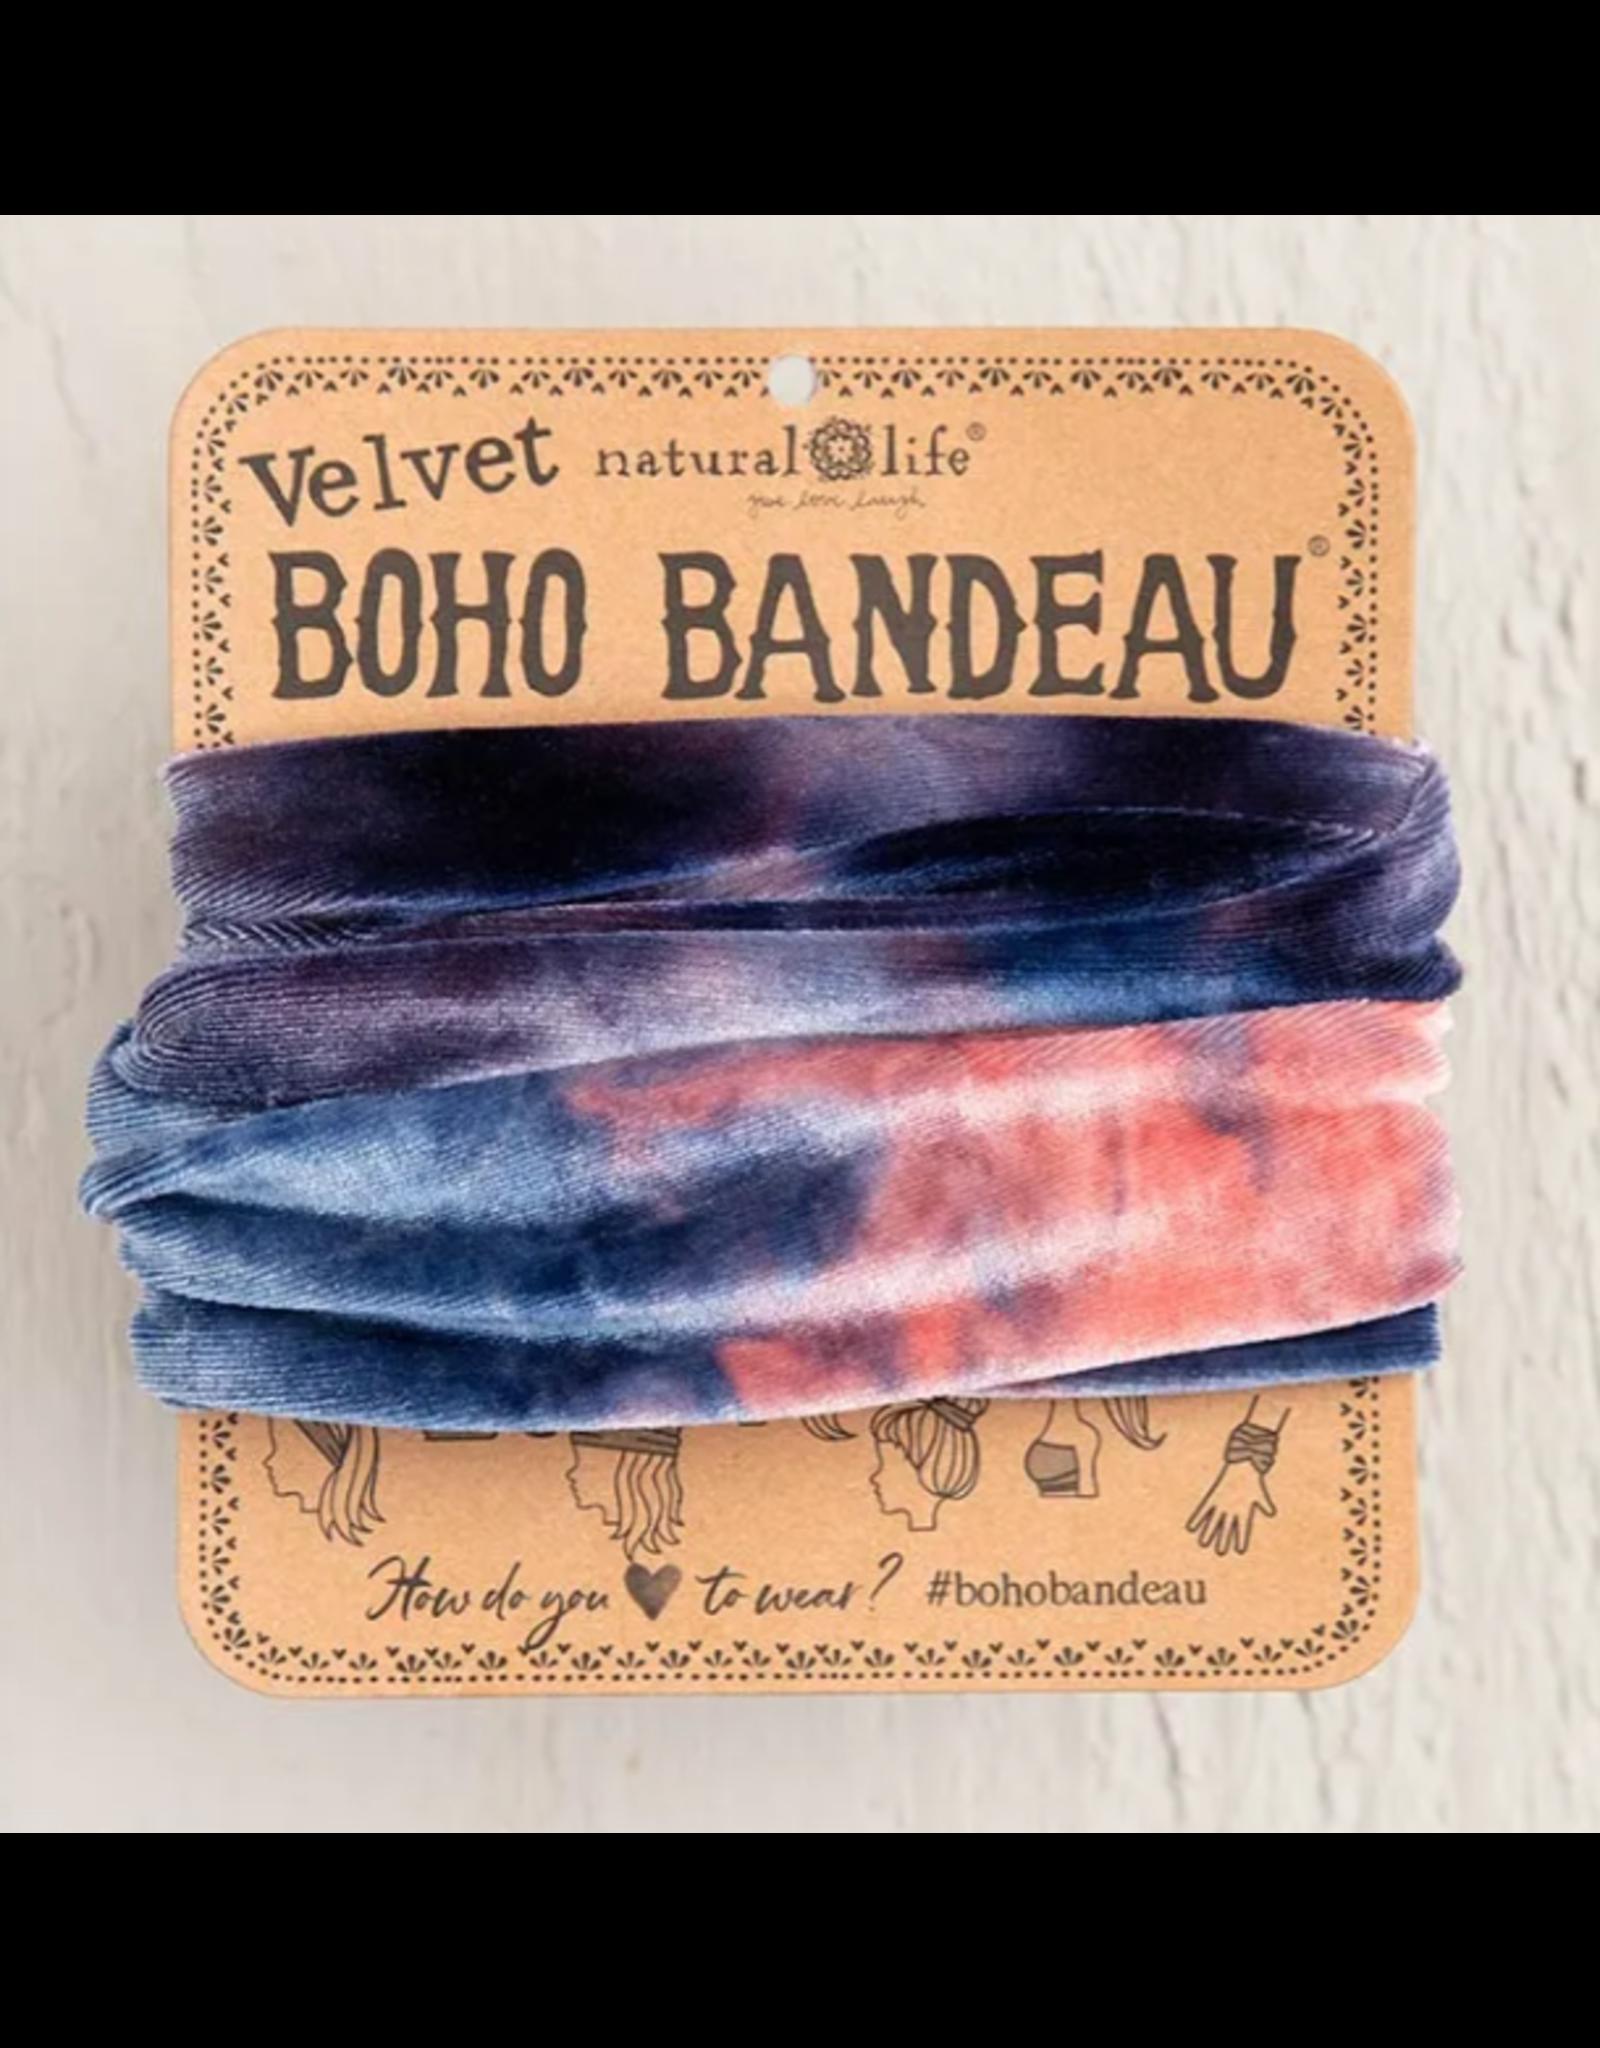 Natural LIfe Boho Bandeau, Velvet Navy Tie-Dye